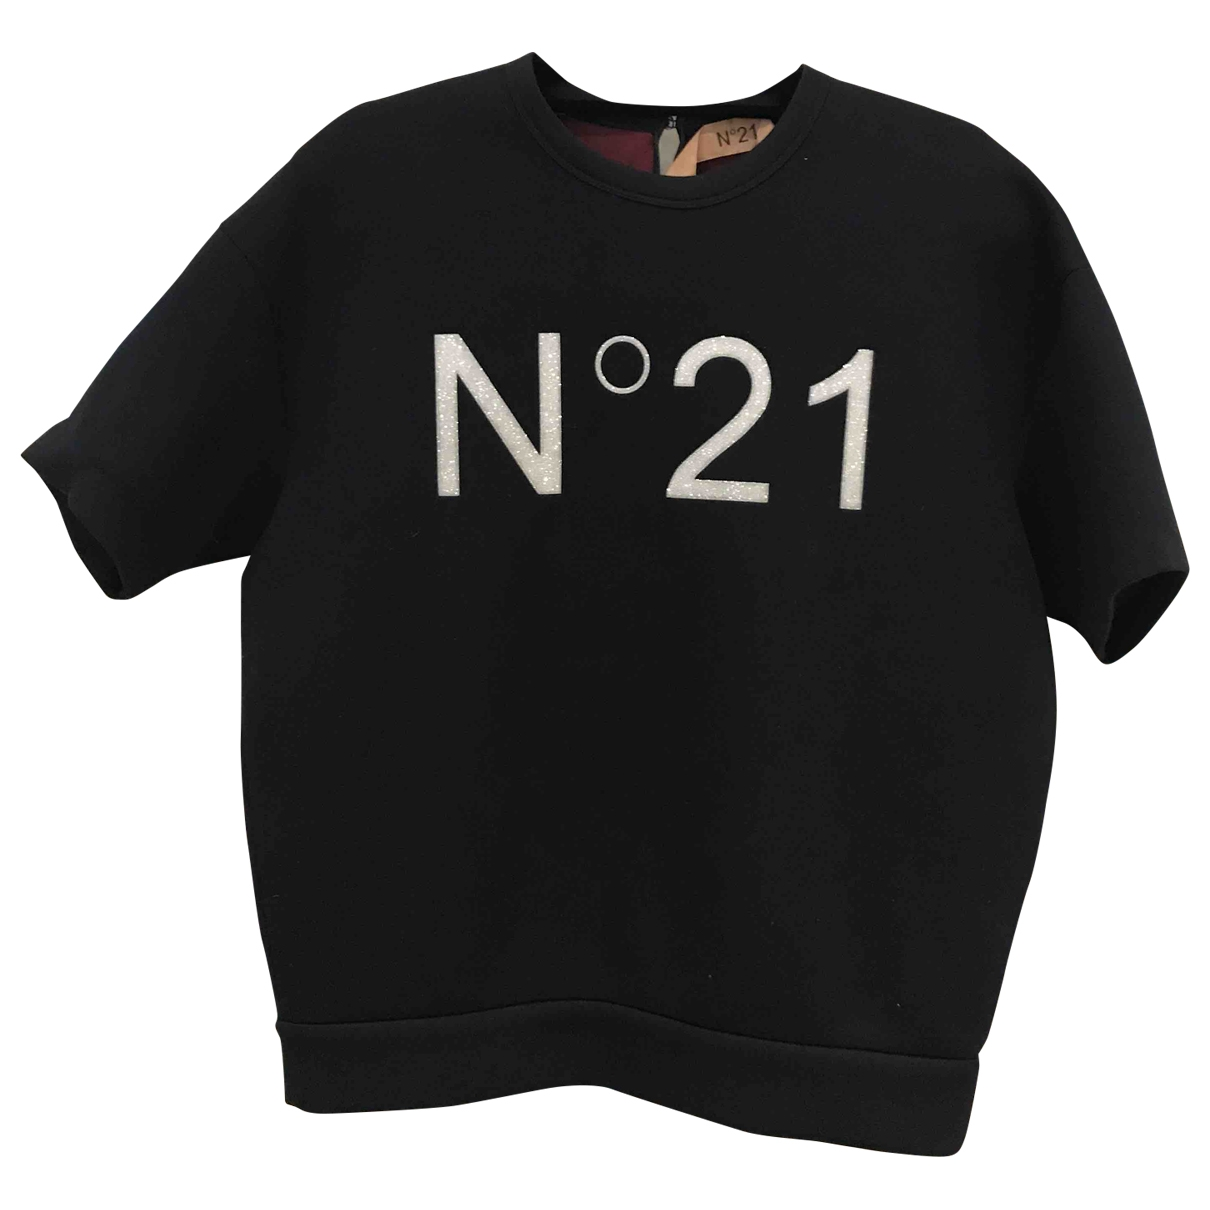 N°21 \N Navy Sponge  top for Women 38 IT